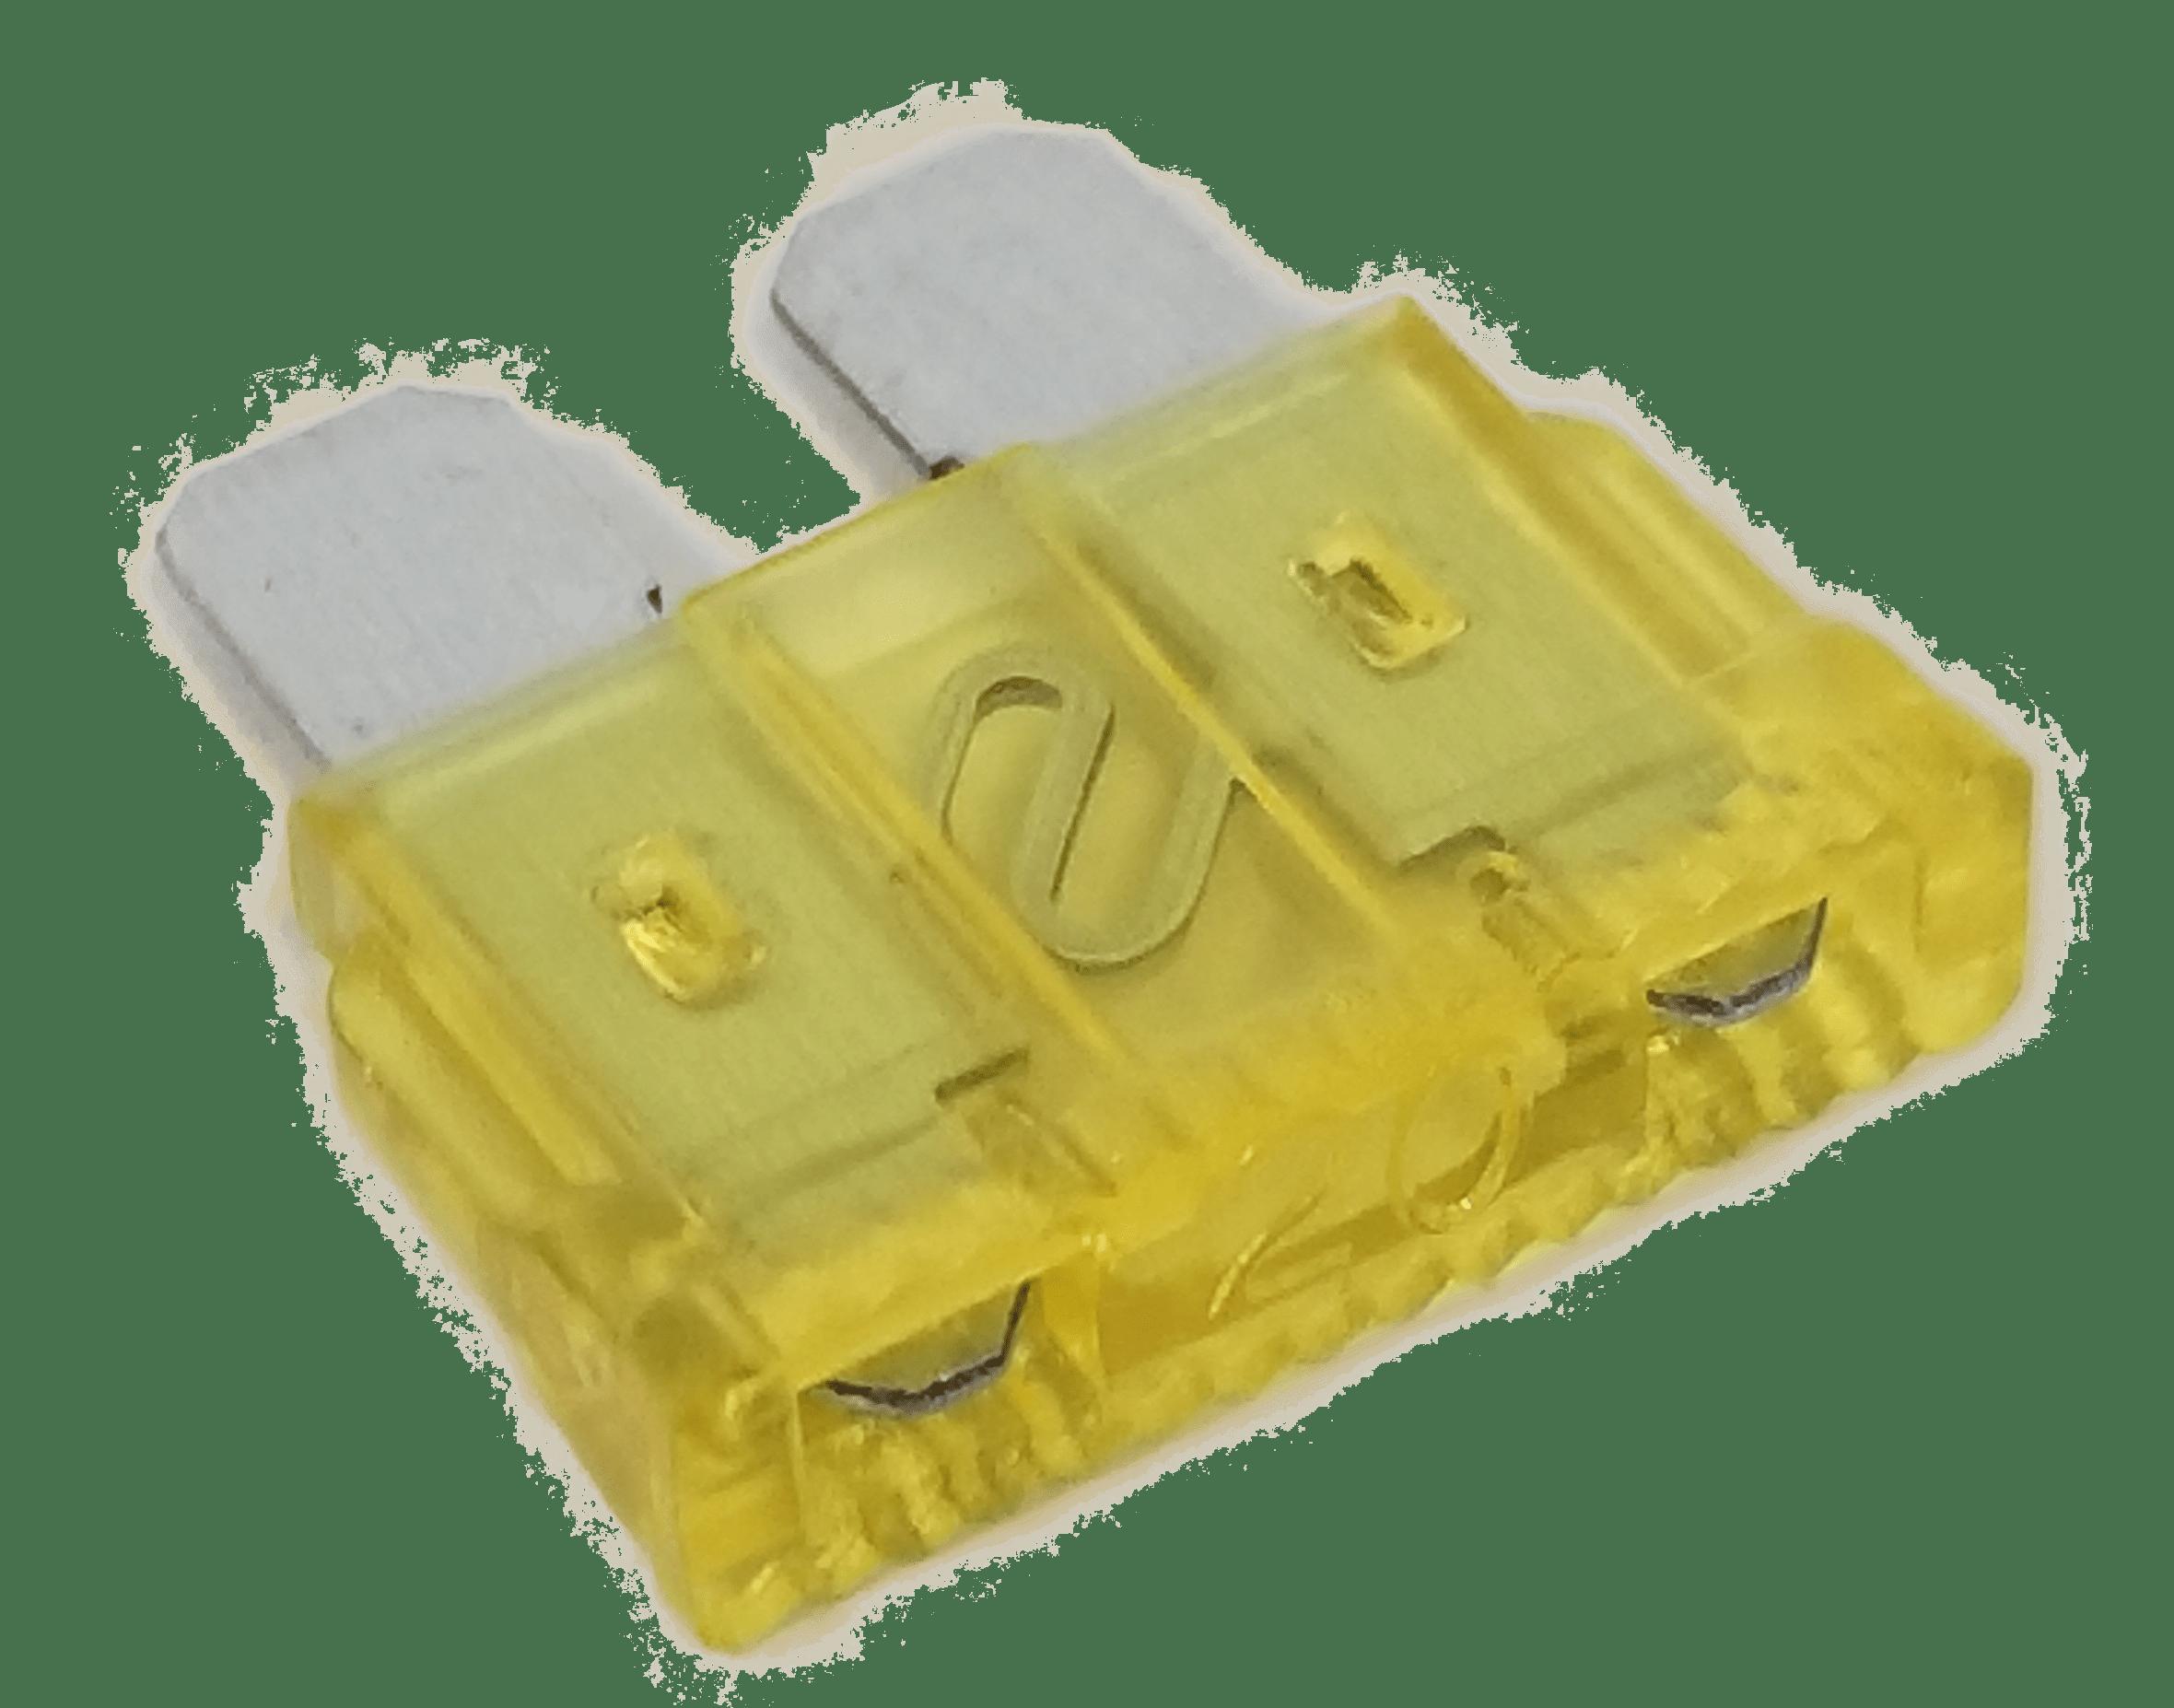 FATC20X - Marmat 20 Amp Blade Fuse (Bulk)